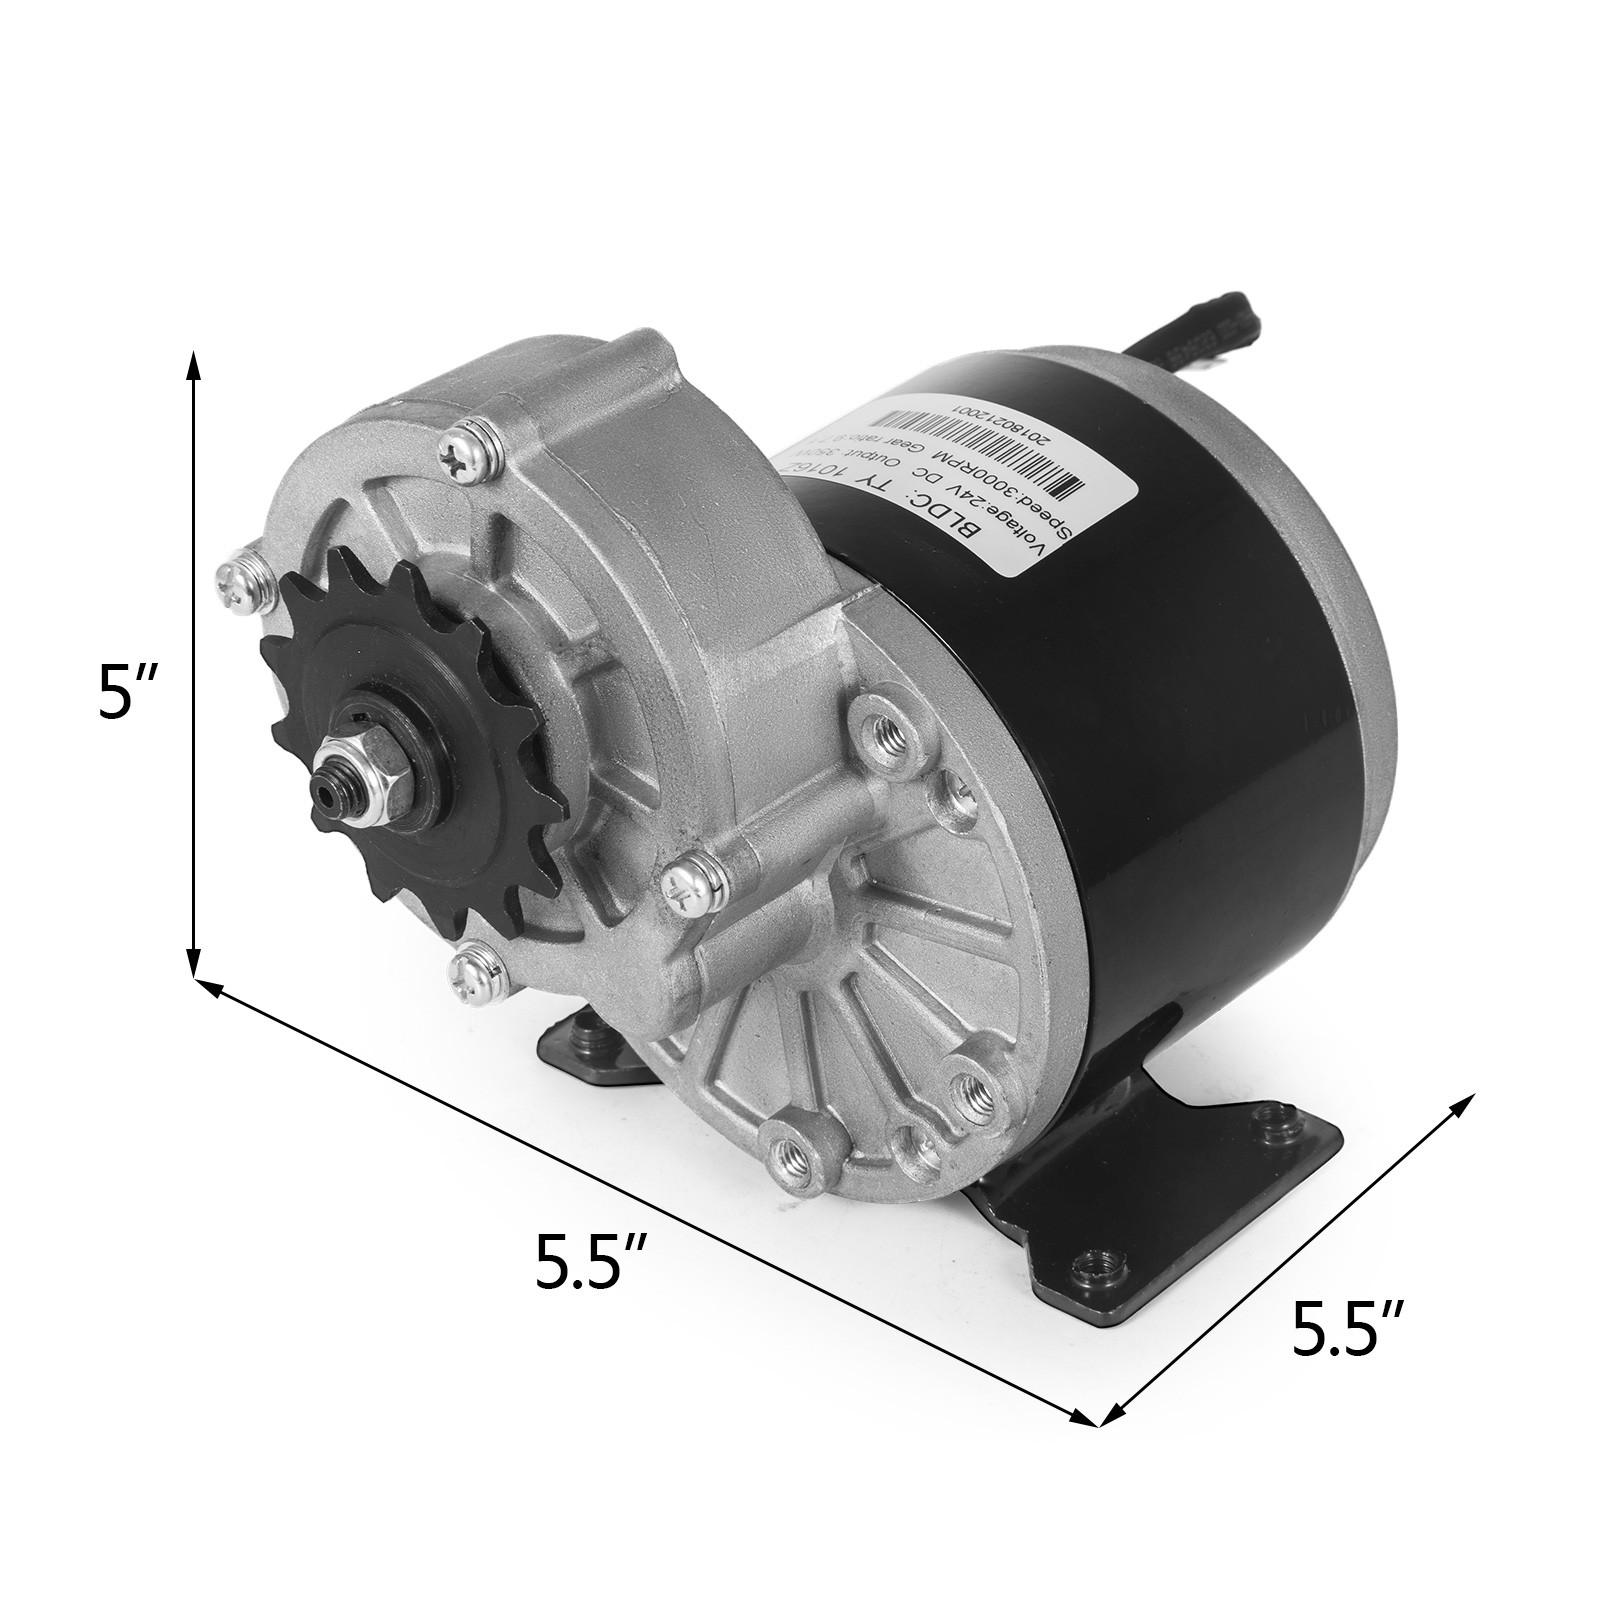 DC-electric-motor-12-60V-150W-2KW-for-scooter-bike-go-kart-minibike-e-ATV thumbnail 50